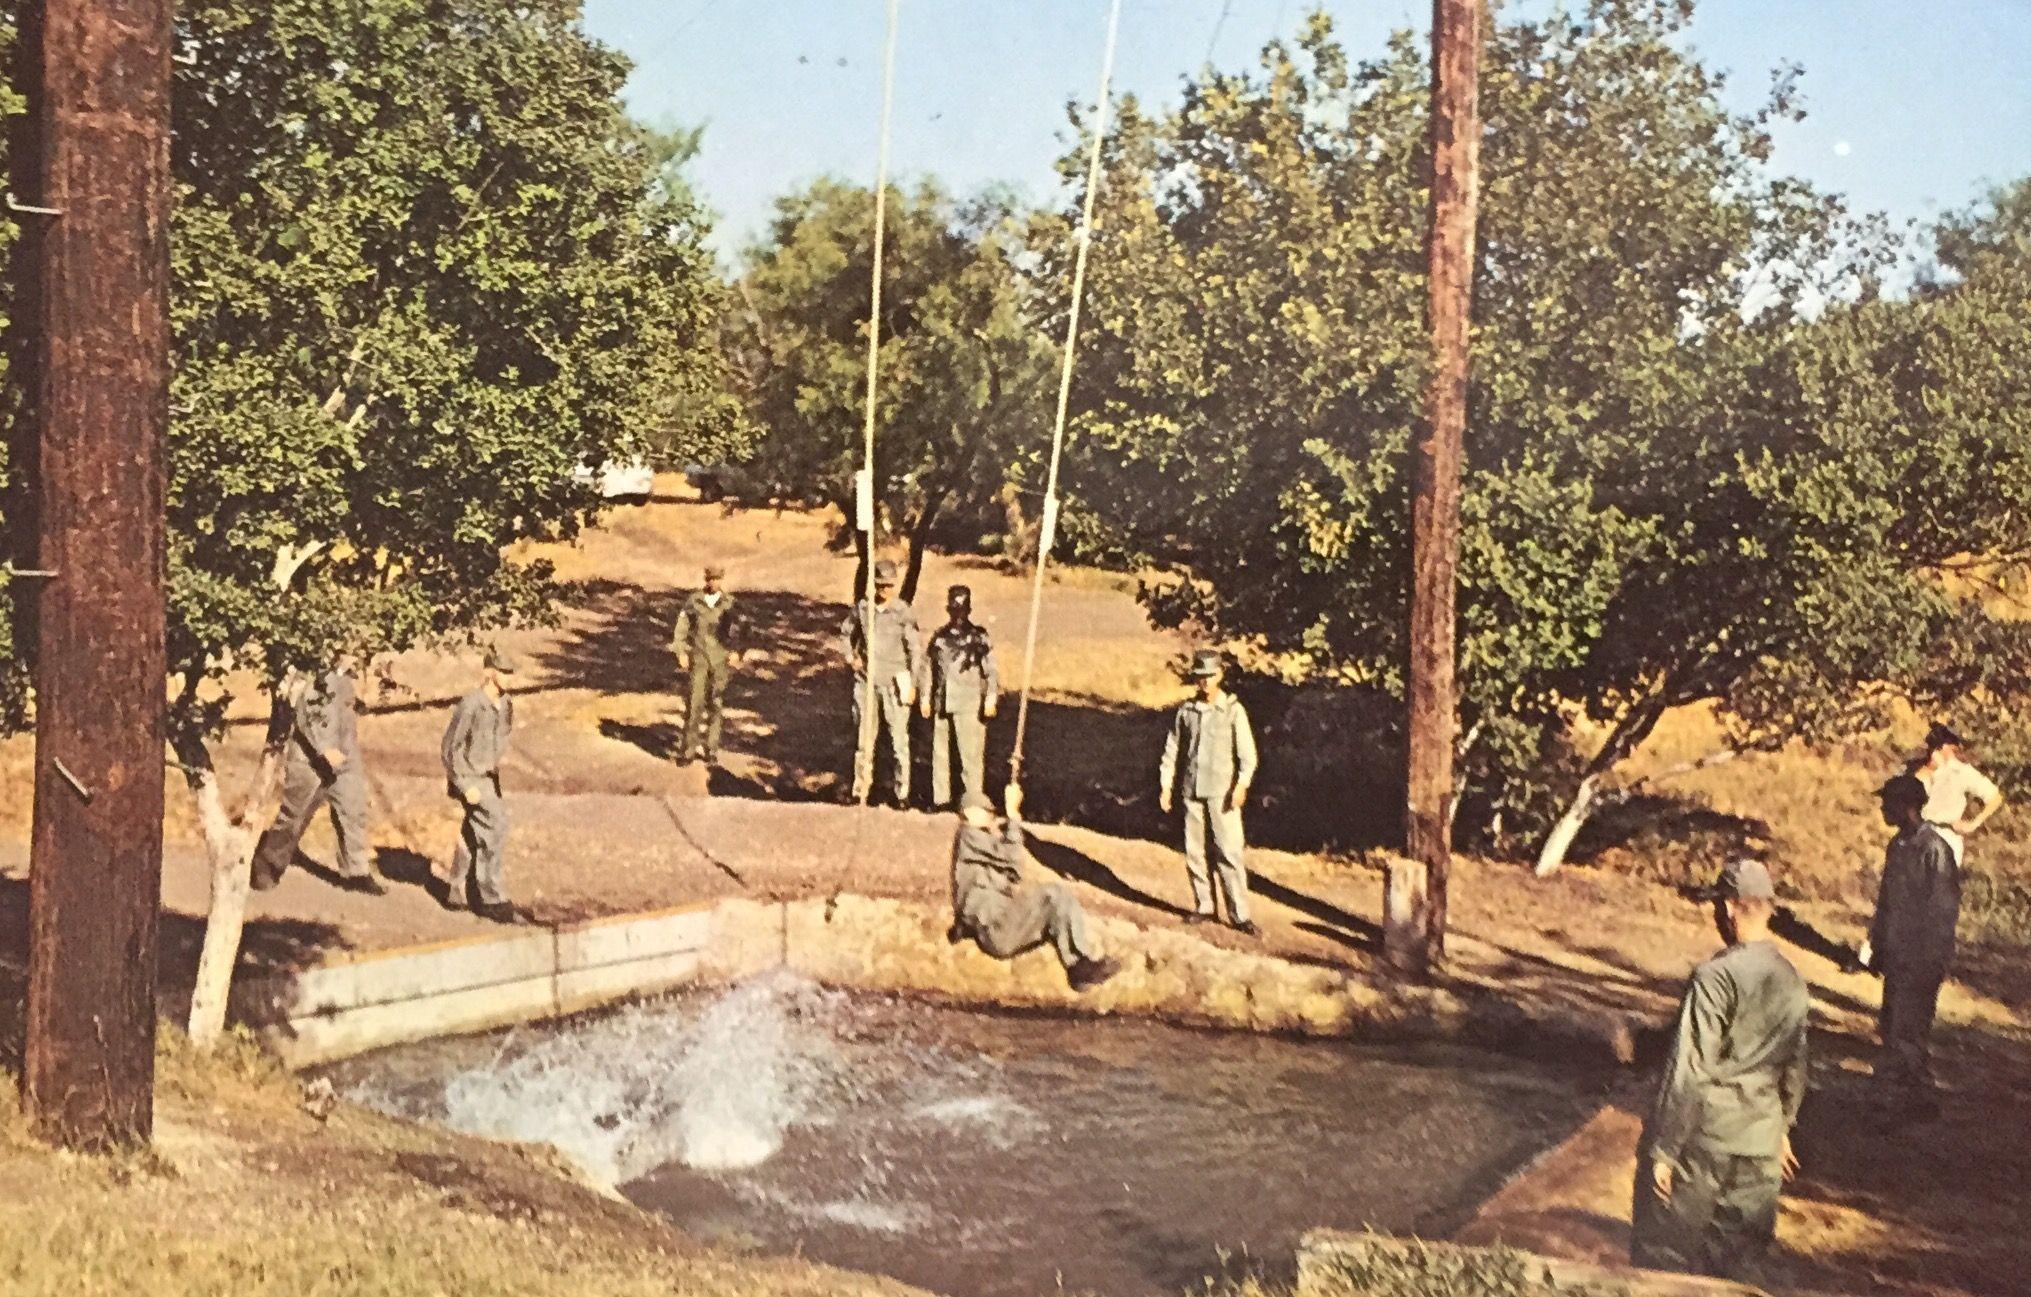 Basic training lackland afb 1969 lackland air force base